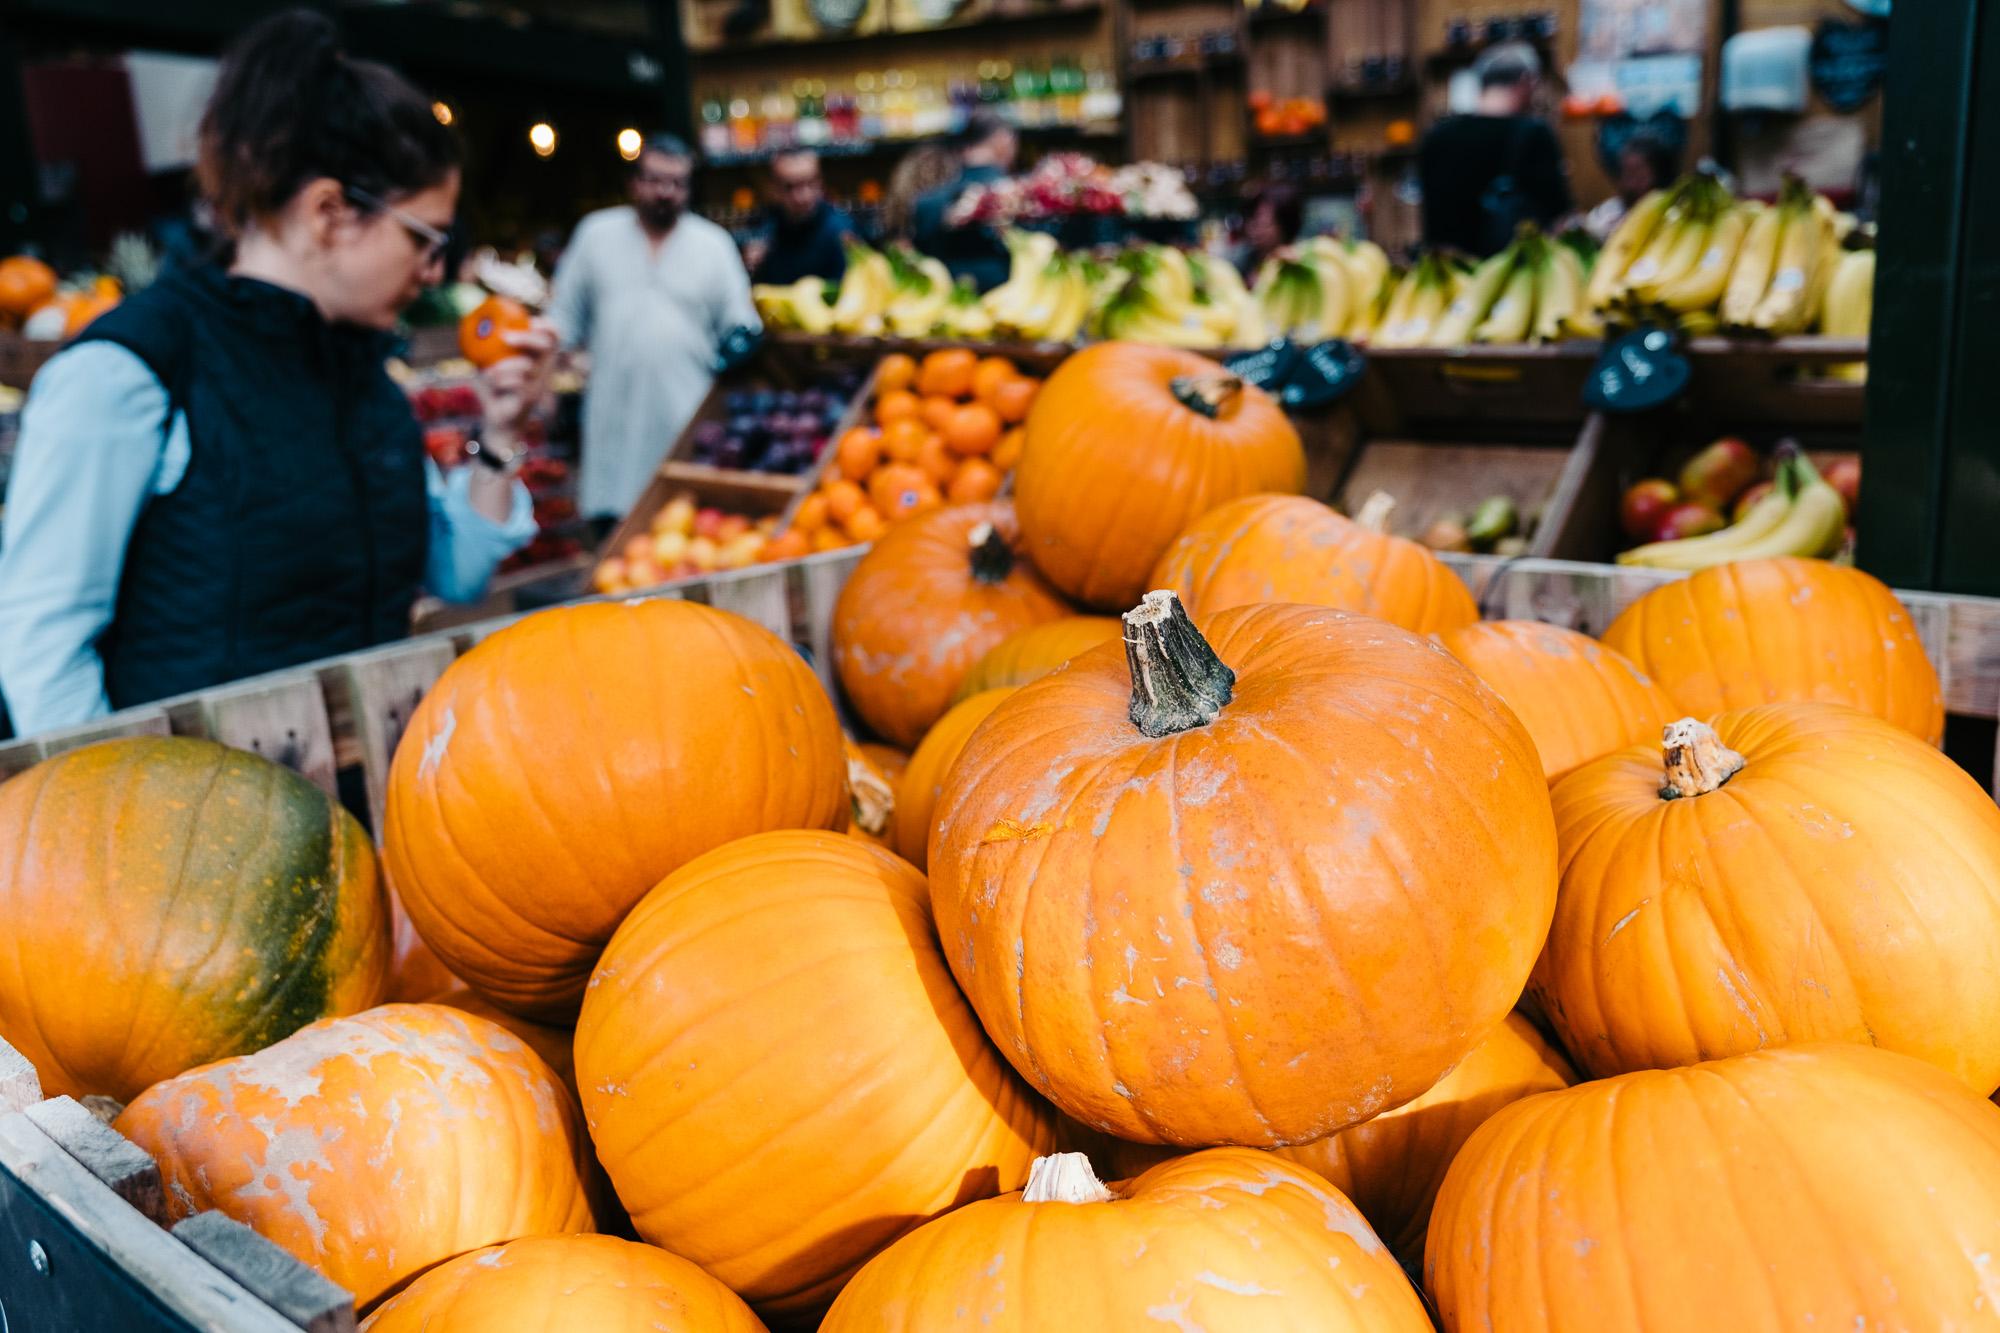 Pumpkins at Borough Market © Andrew Newson